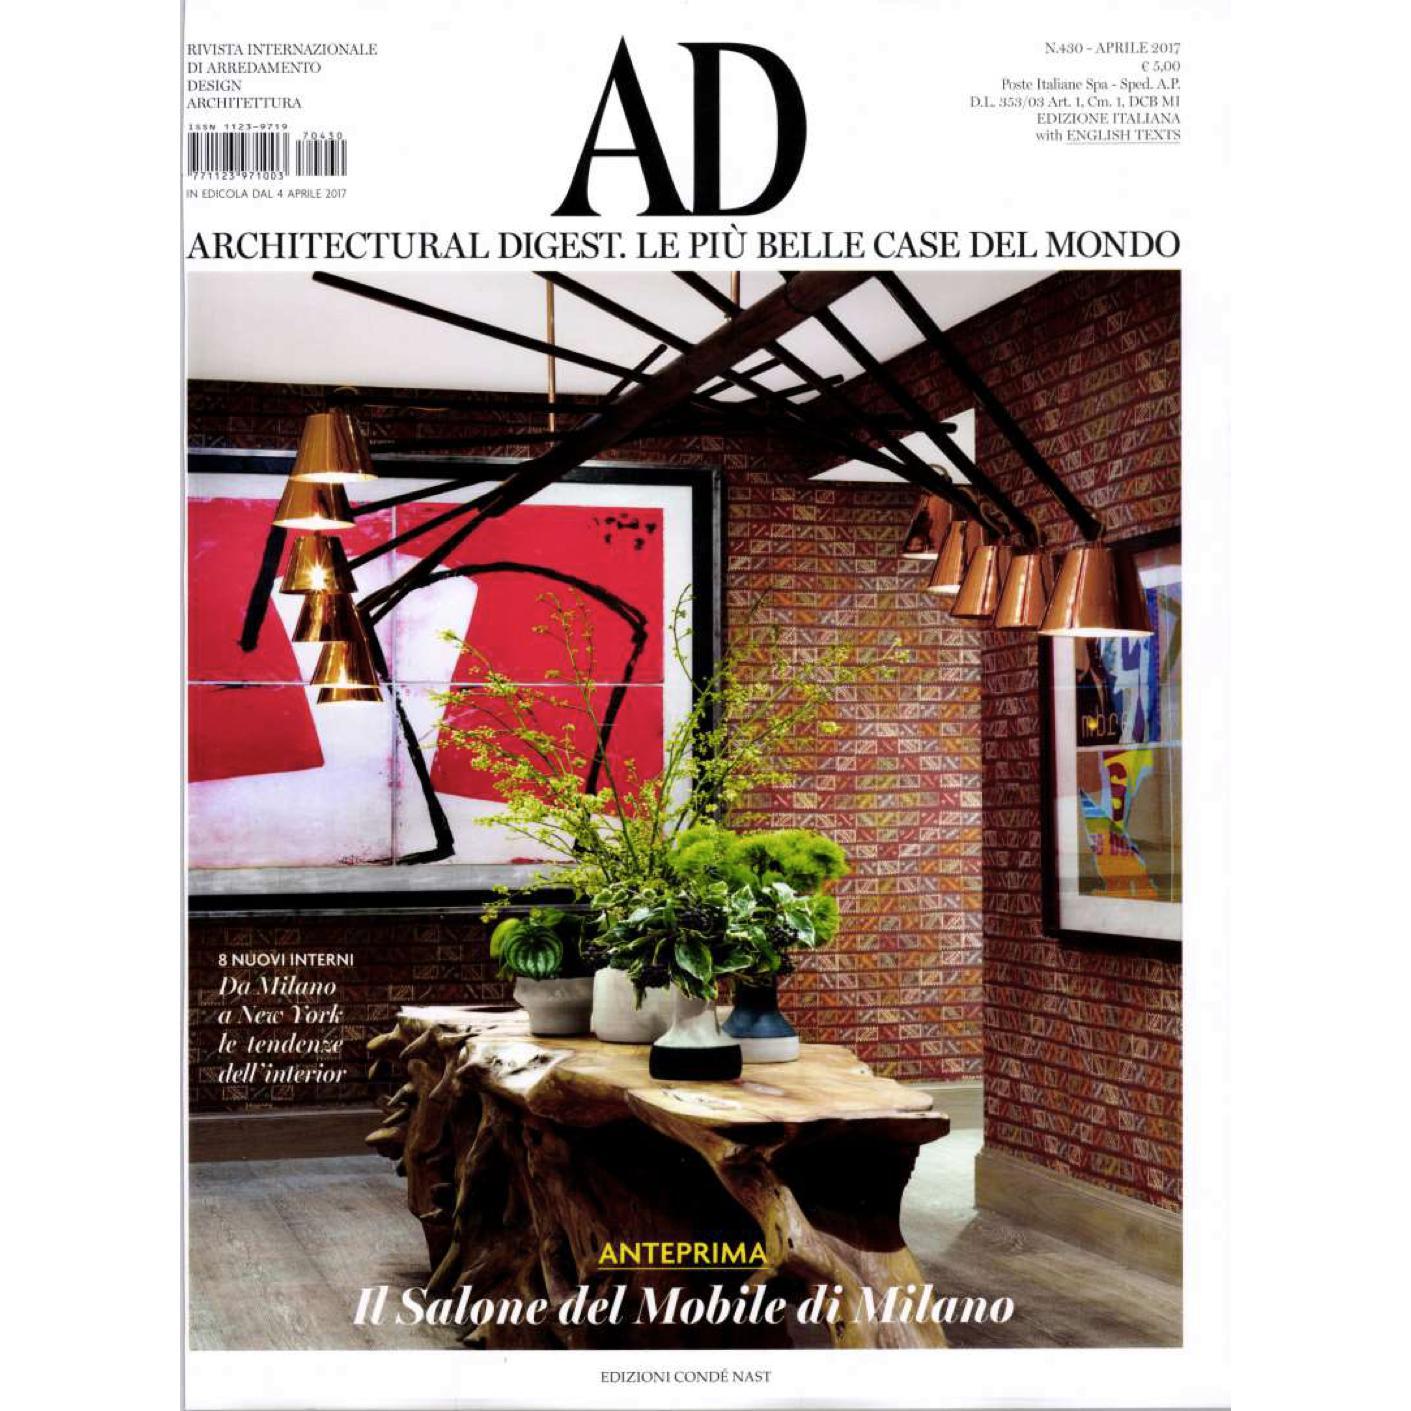 Ad P Architetti ad archives - rossana orlandi